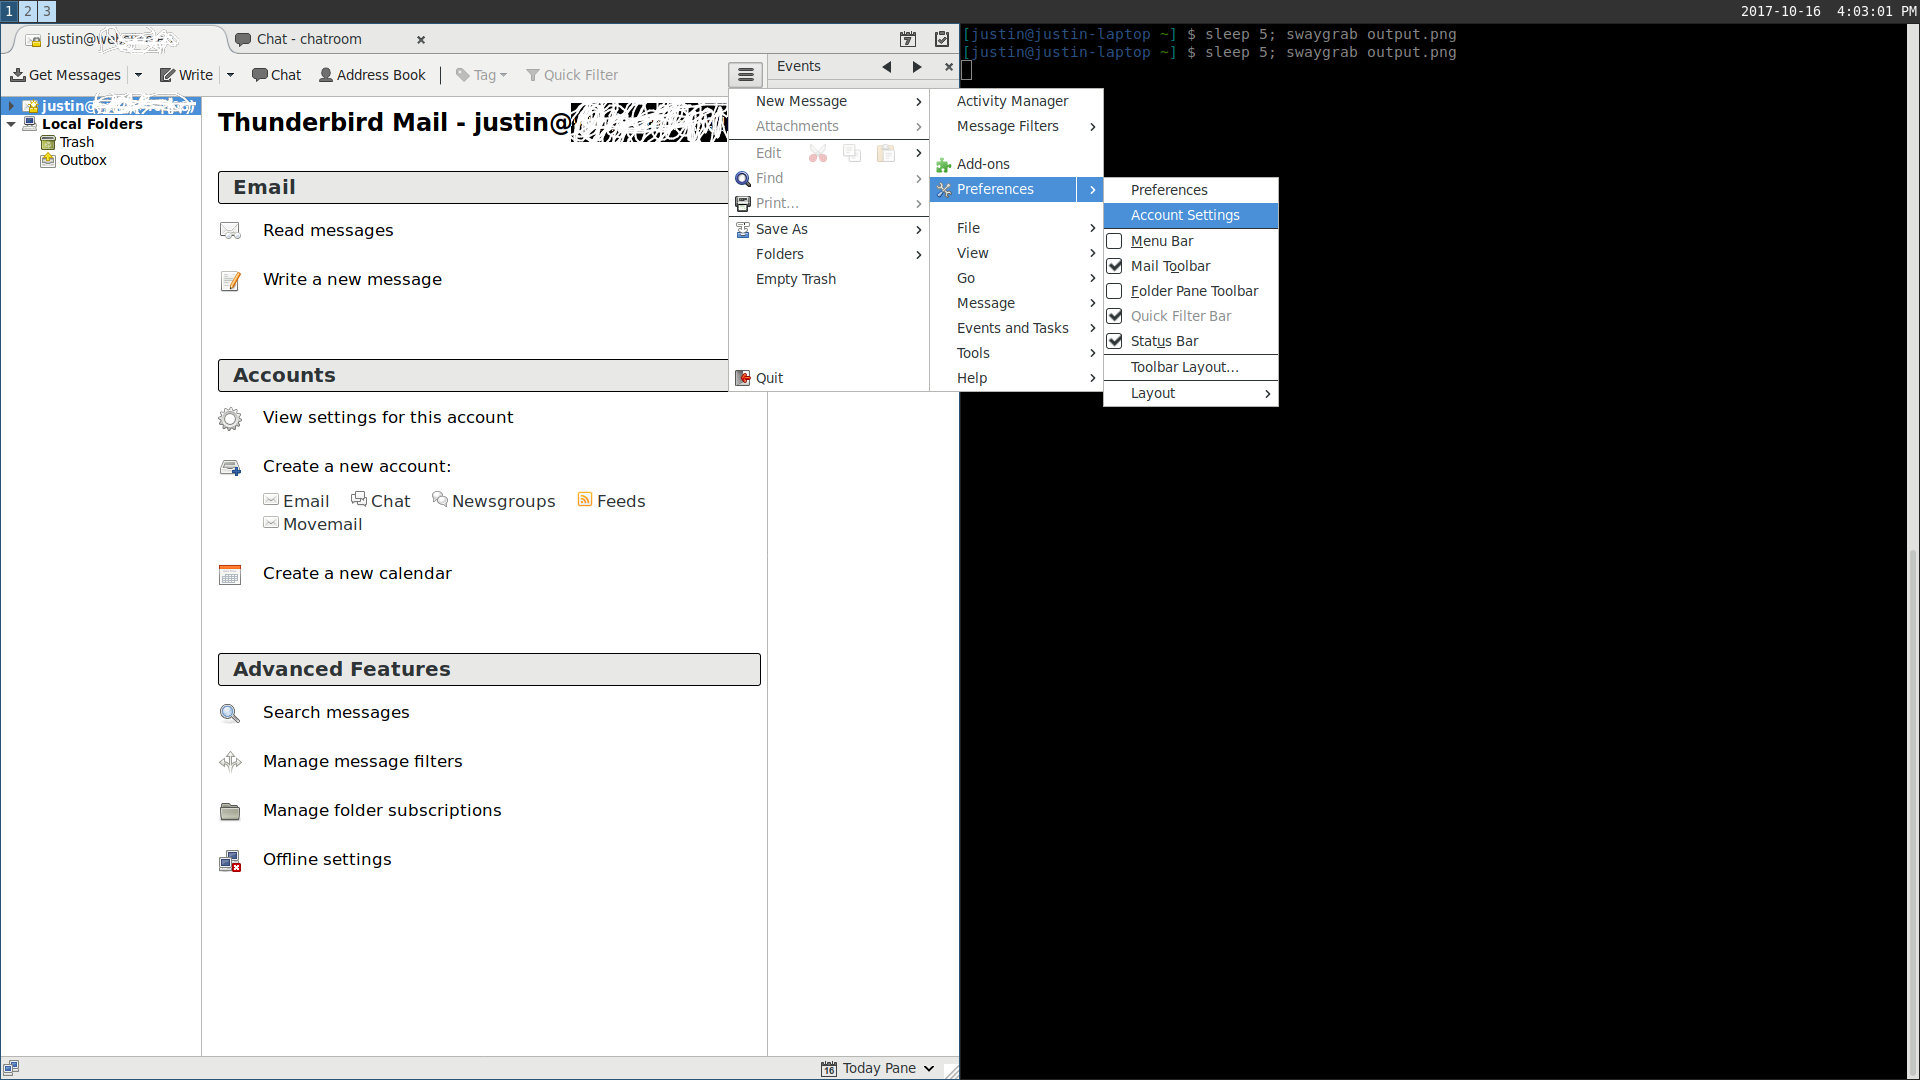 sway-0 14: Thunderbird account settings window opens like a